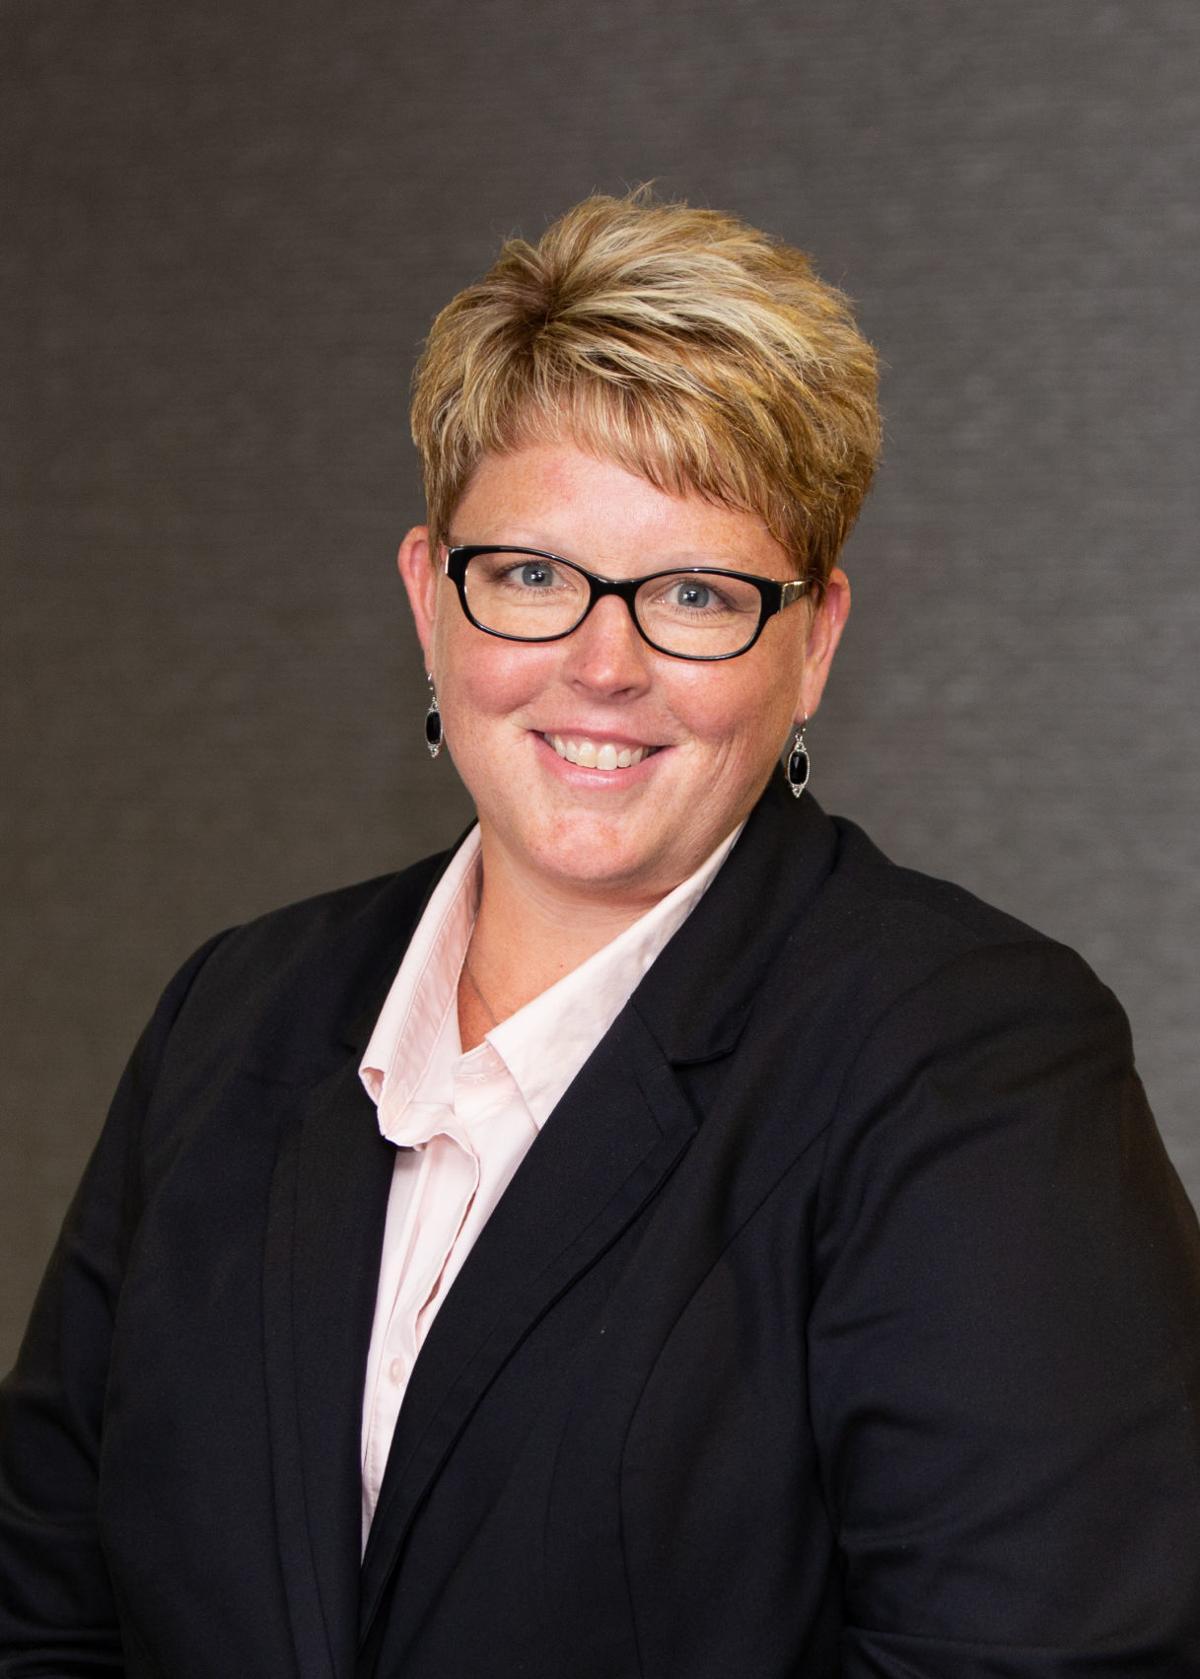 Amy Reynoldson named Nebraska Medical Association EVP